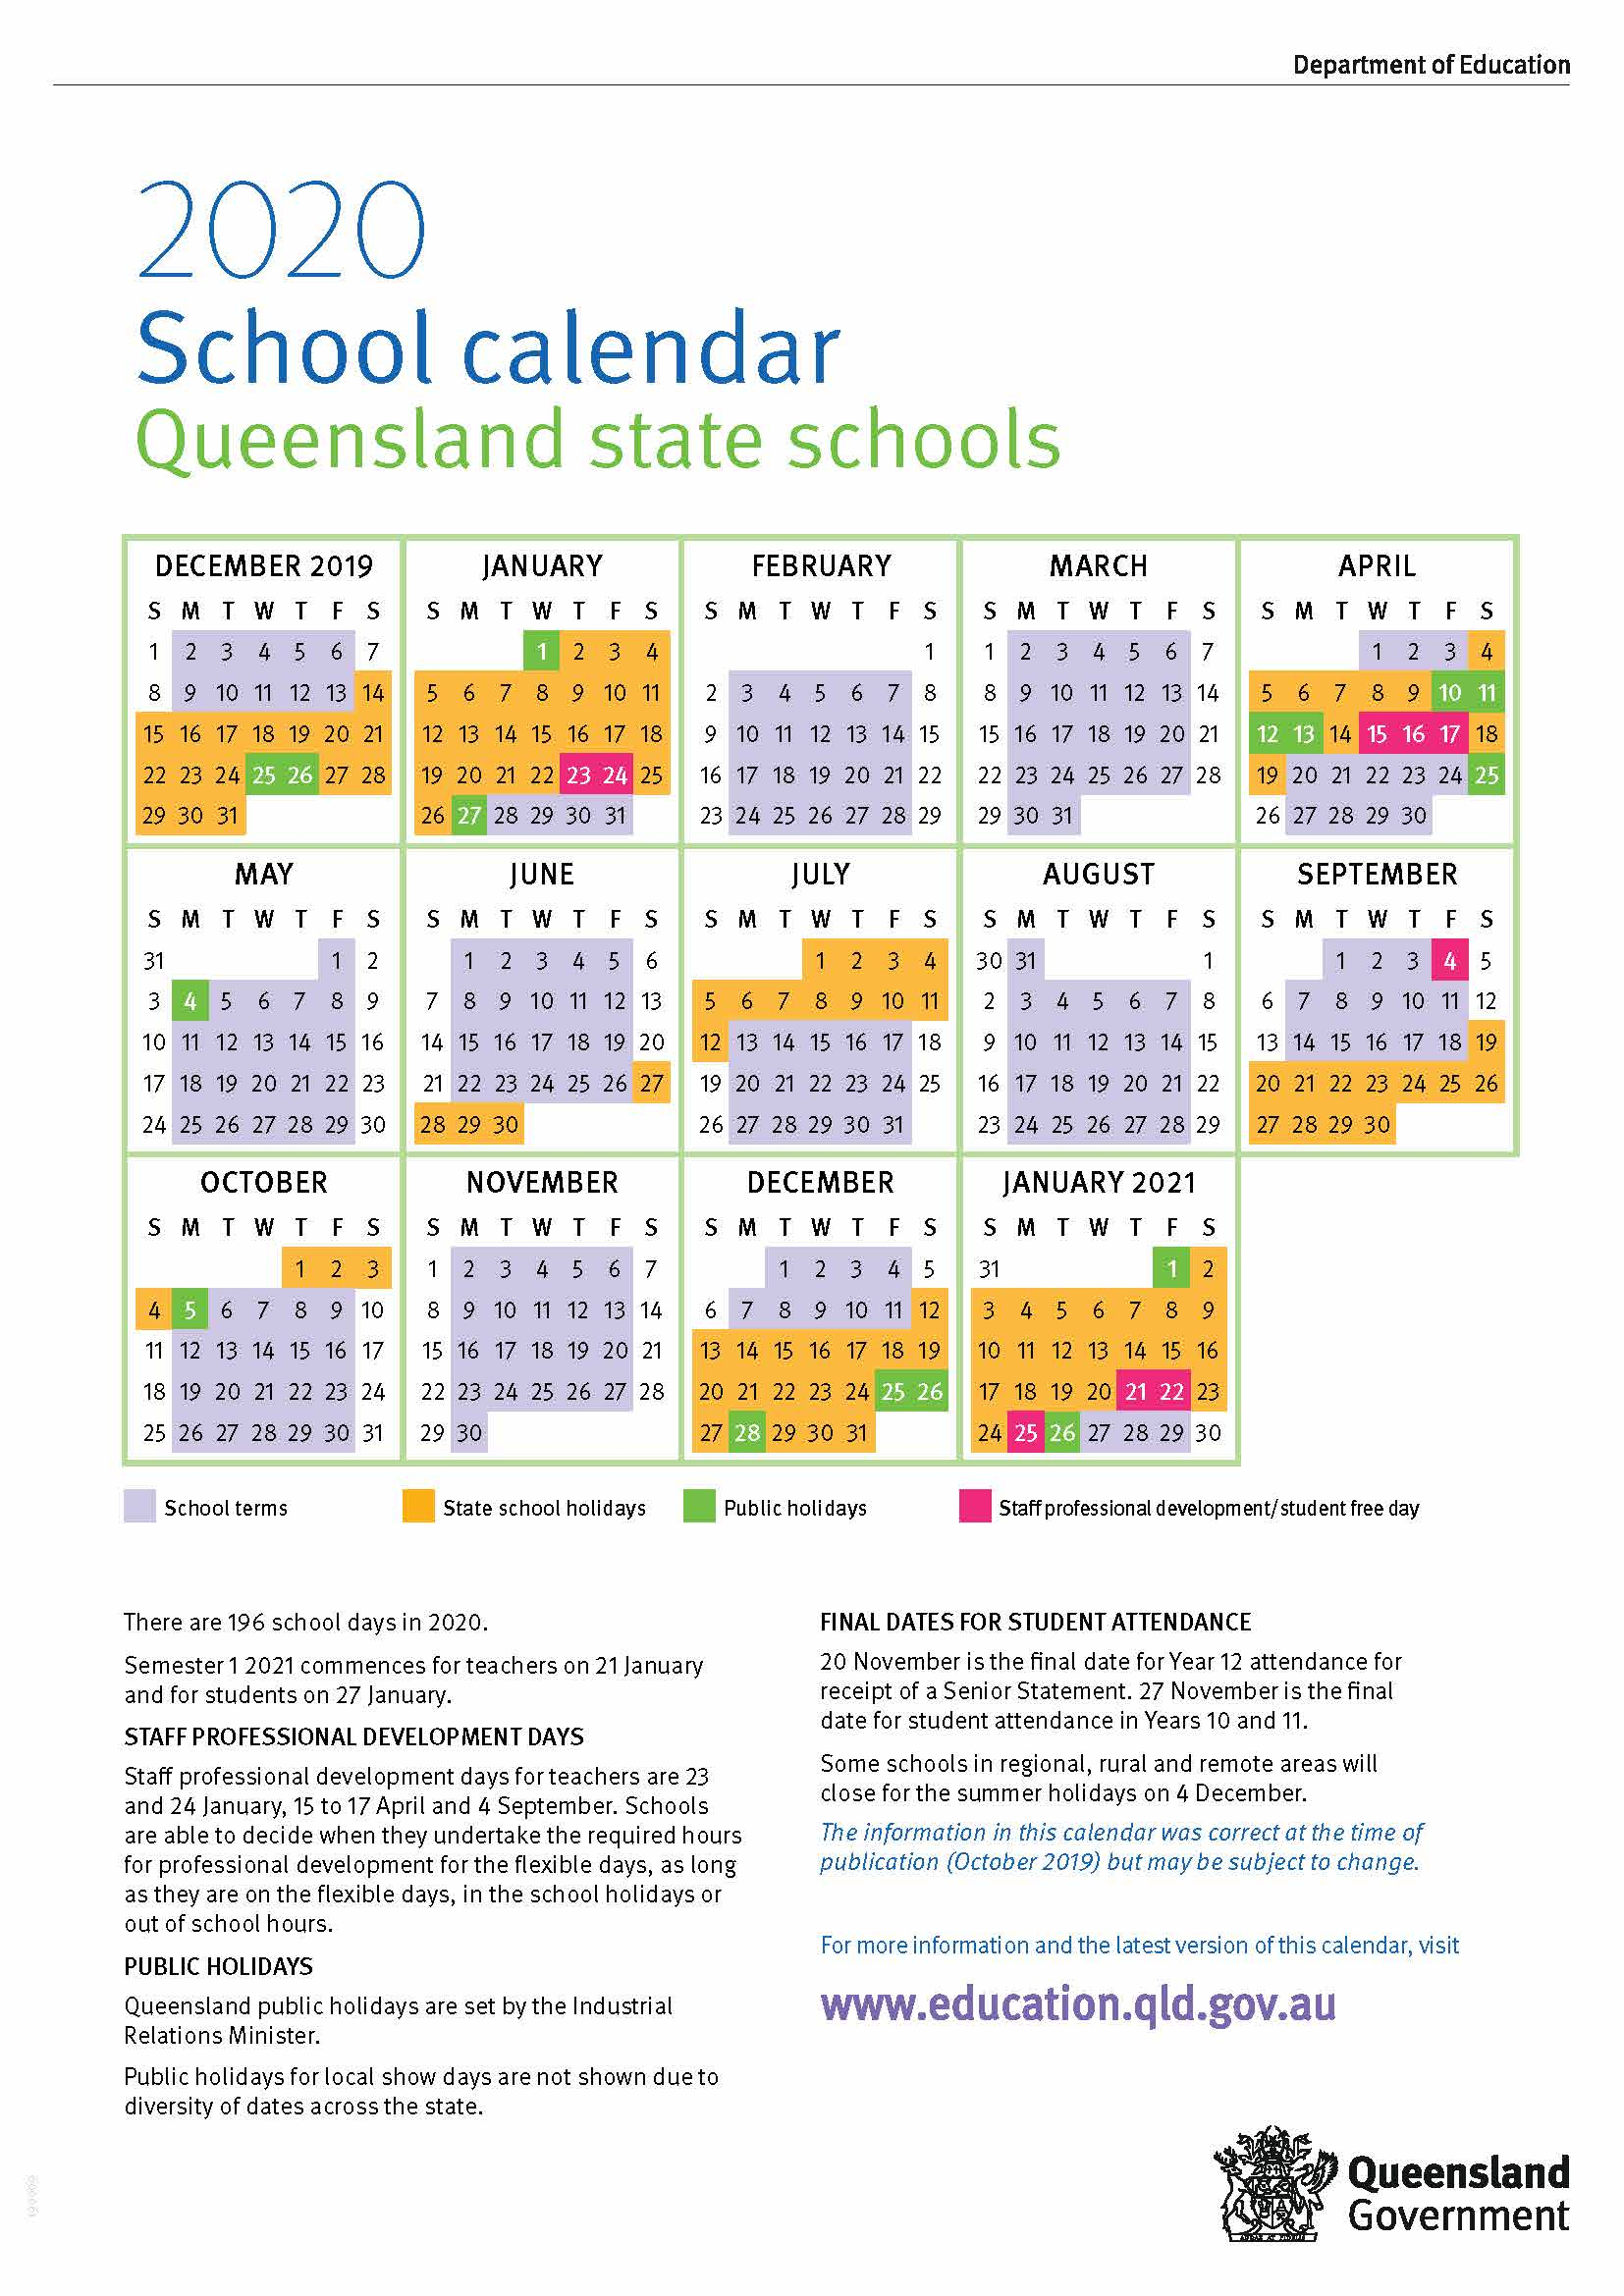 2020 Queensland State School Calendar pertaining to 2020 School Calendar Queensland State Schools